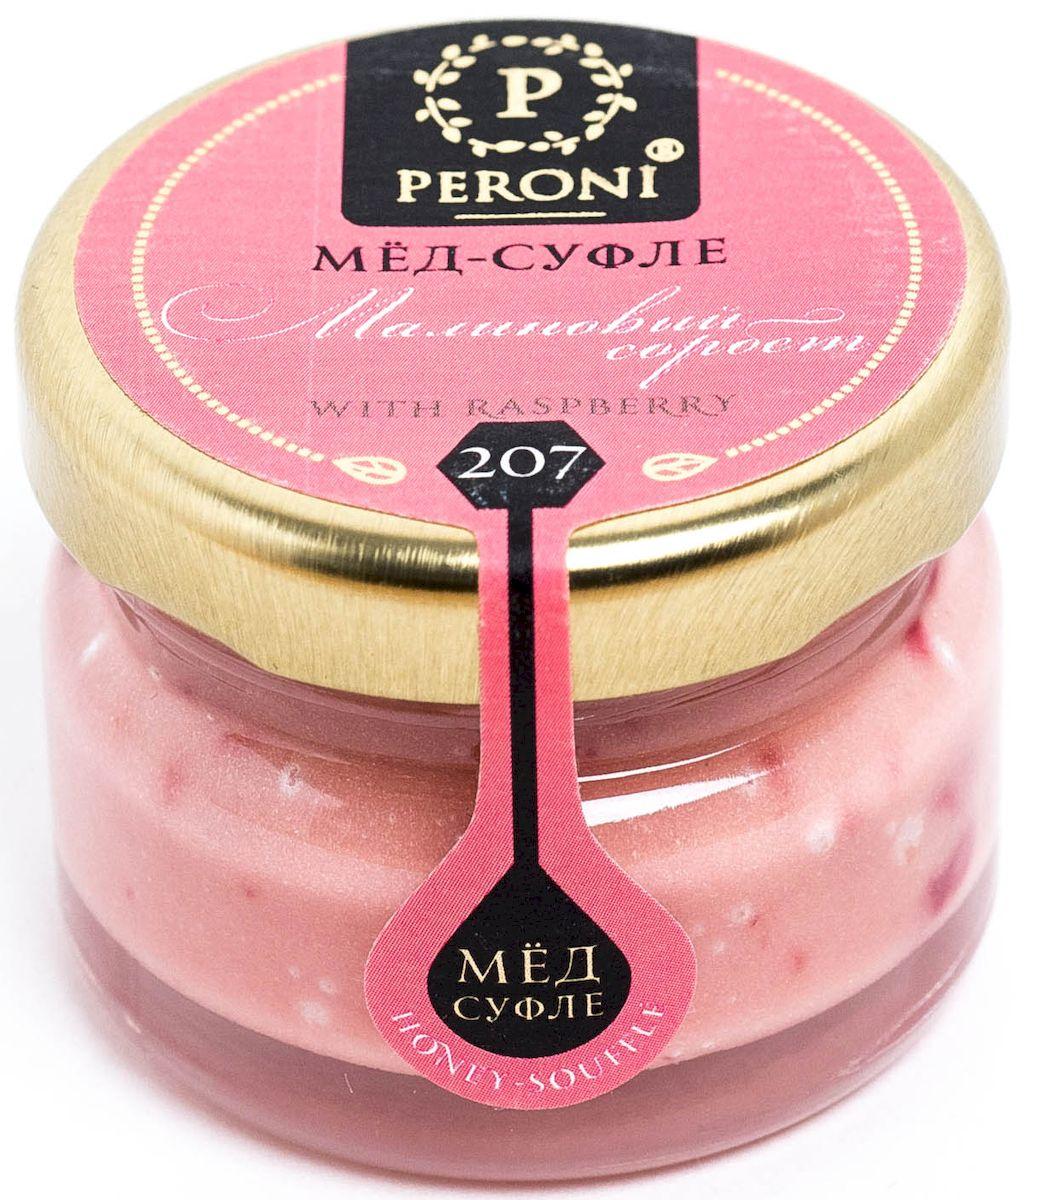 Peroni Малиновый сорбет мёд-суфле, 30 г peroni кедровый орешек мёд суфле 220 г